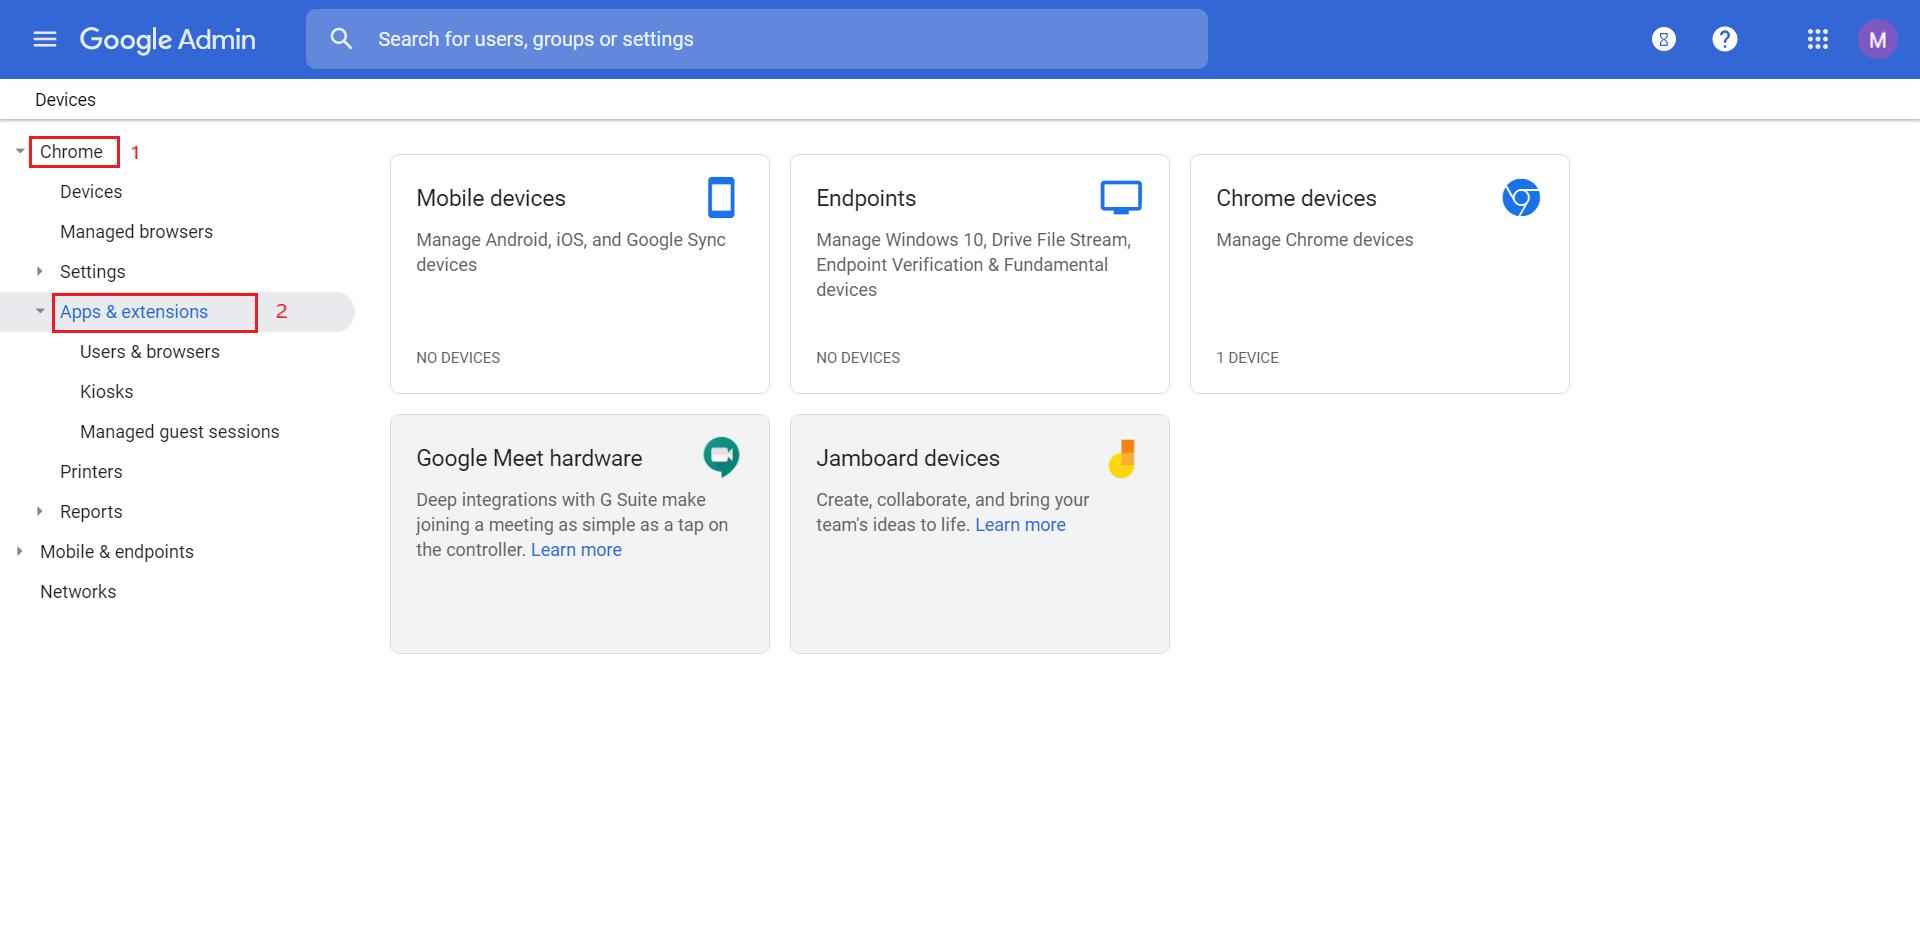 Chrome integration using G Suite